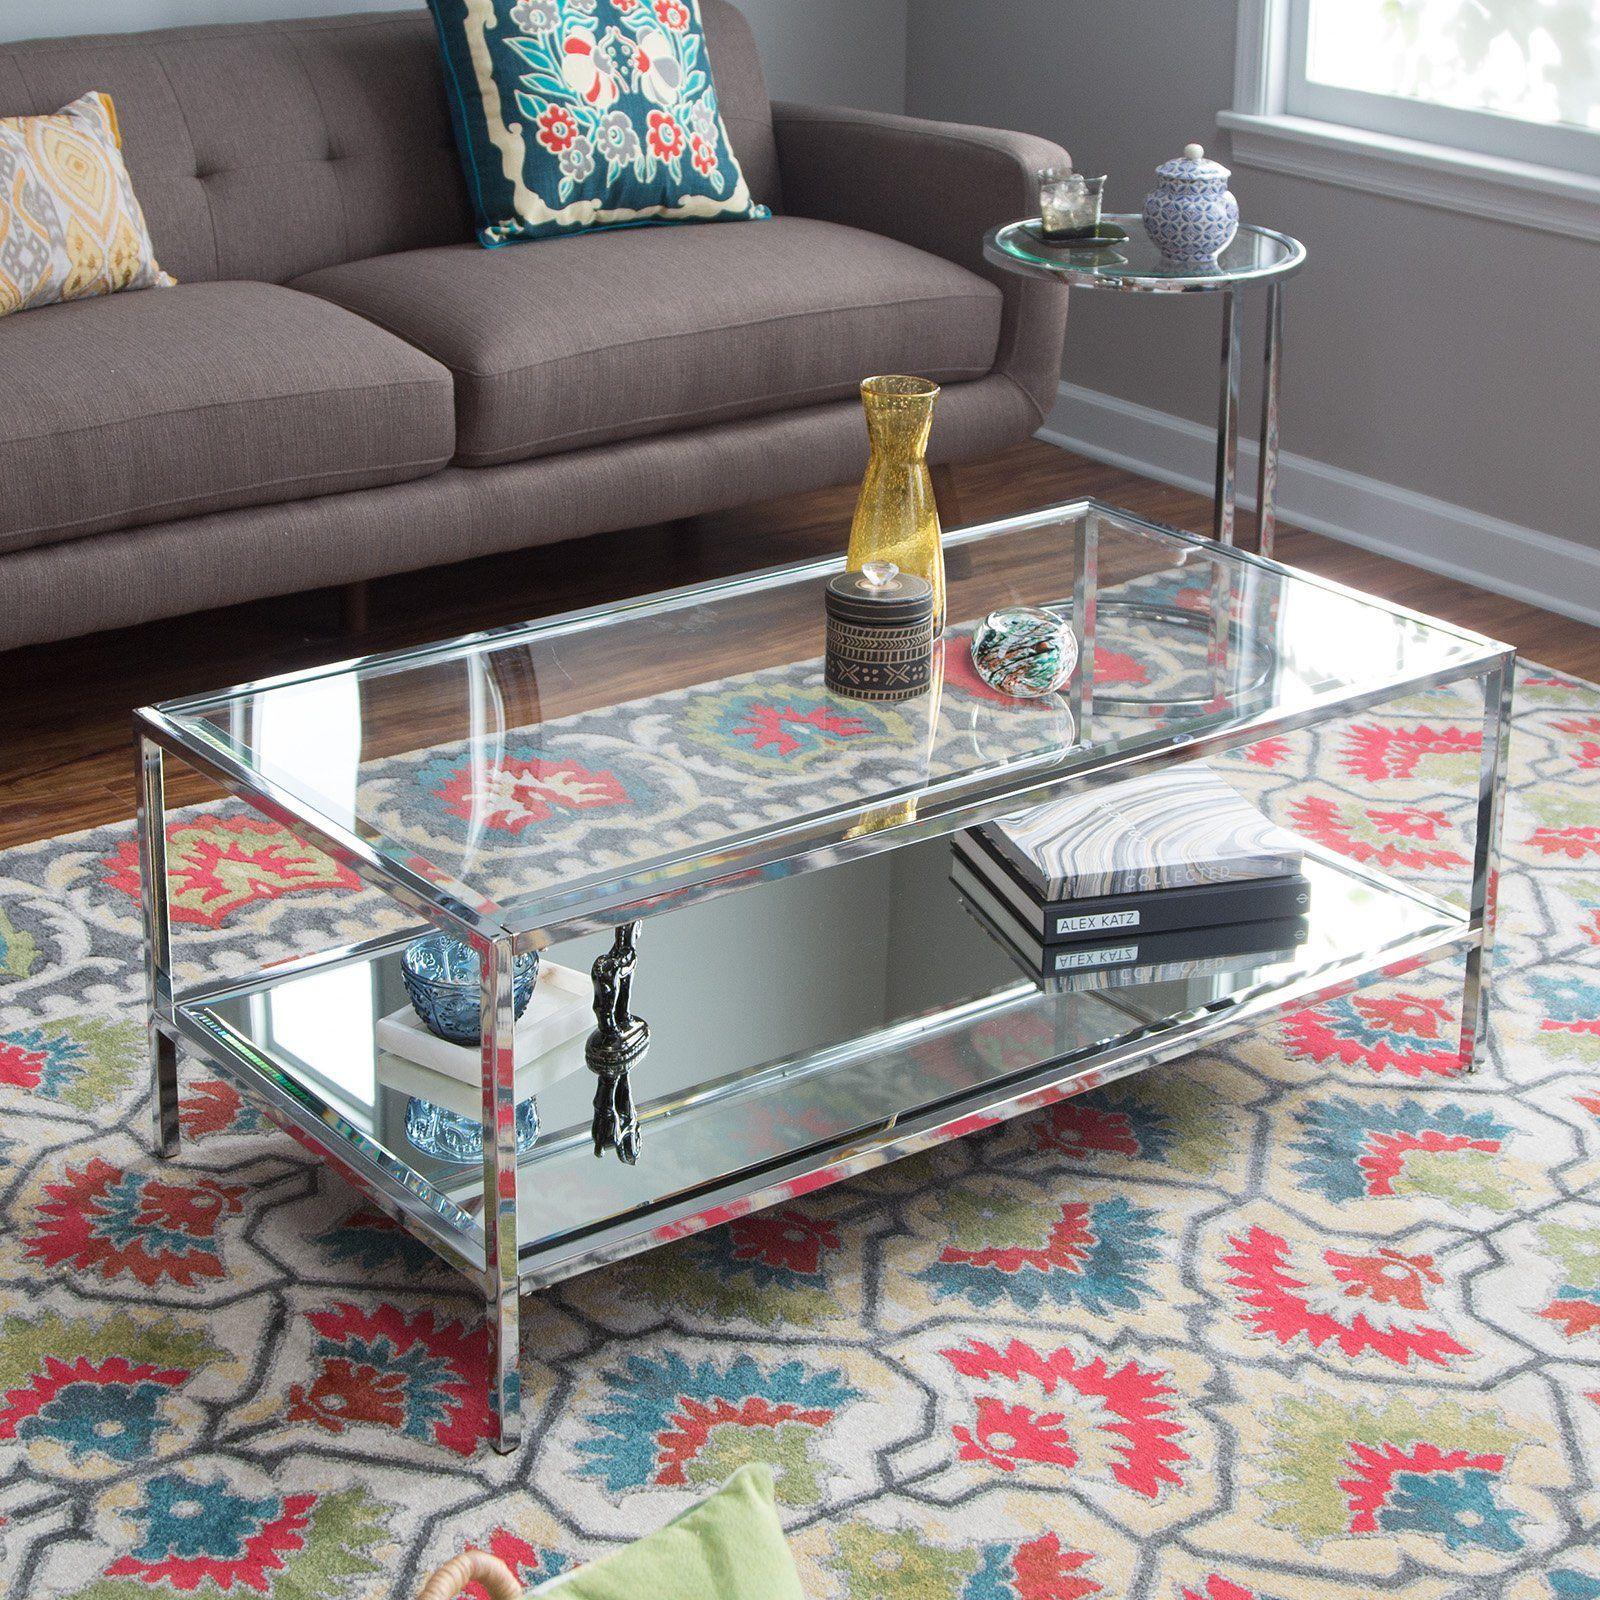 Belham Living Lamont Coffee Table Chrome From Hayneedle Com